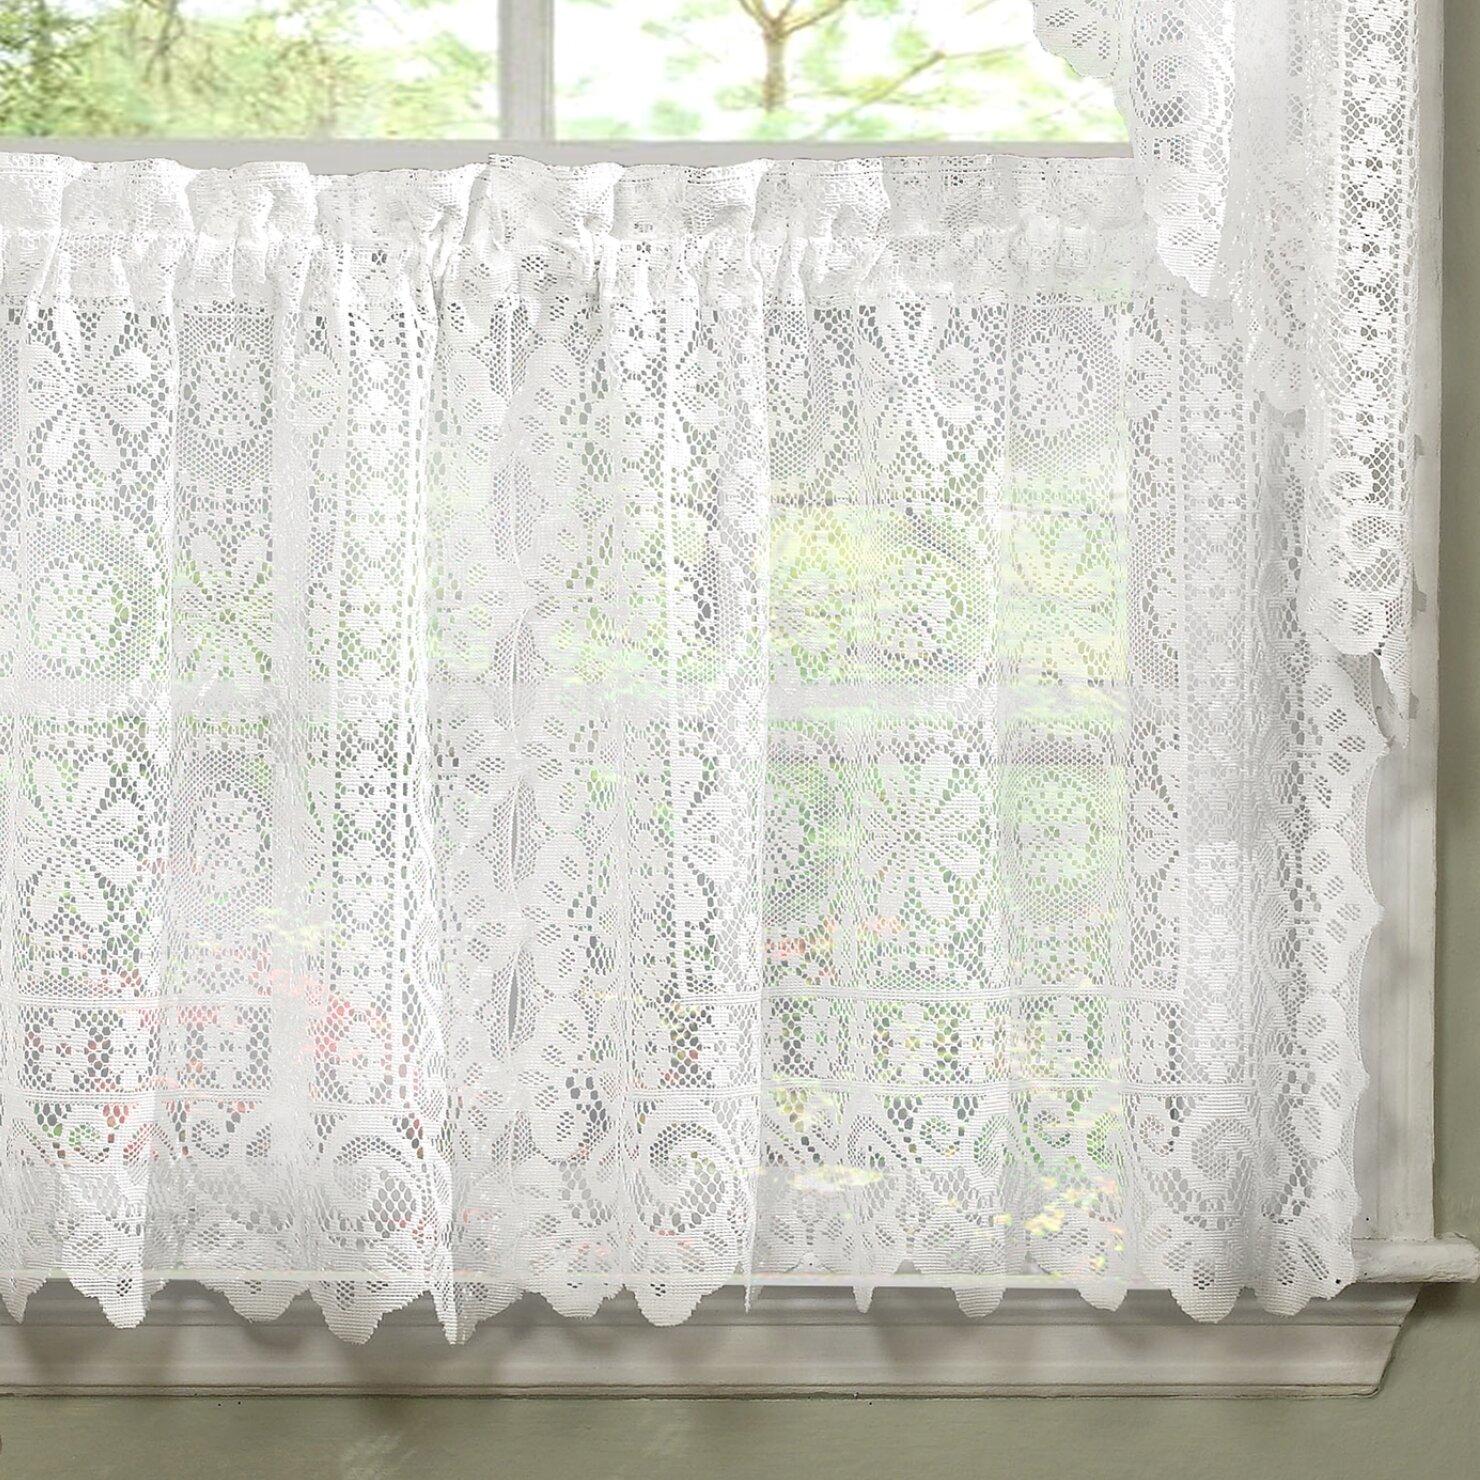 August Grove Bansal Floral Heavy Lace Cafe Curtain Reviews Wayfair Ca